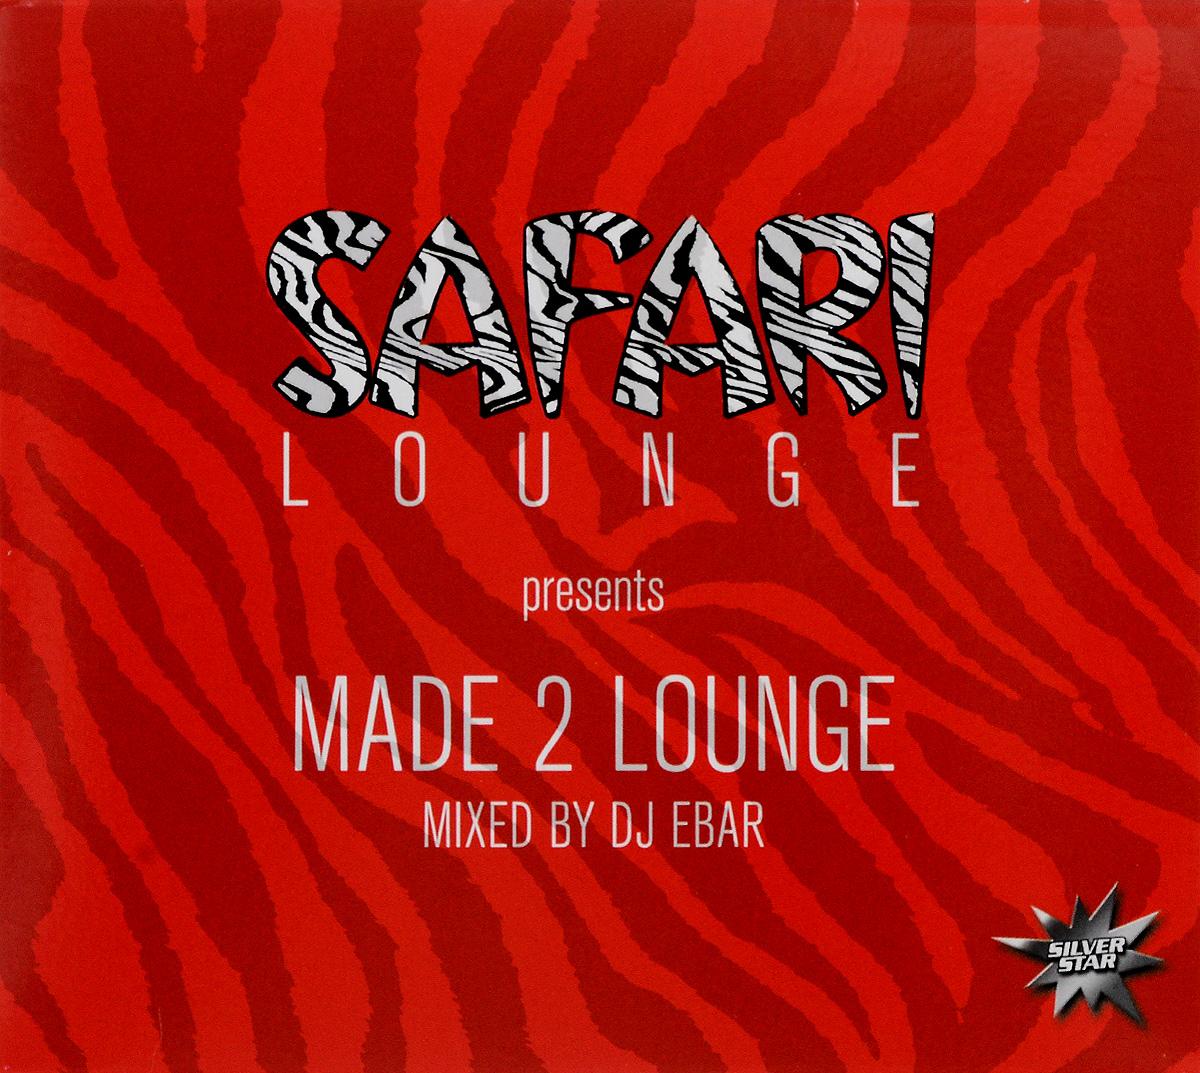 Made 2 Lounge. Mixed By Dj Ebar 2014 Audio CD